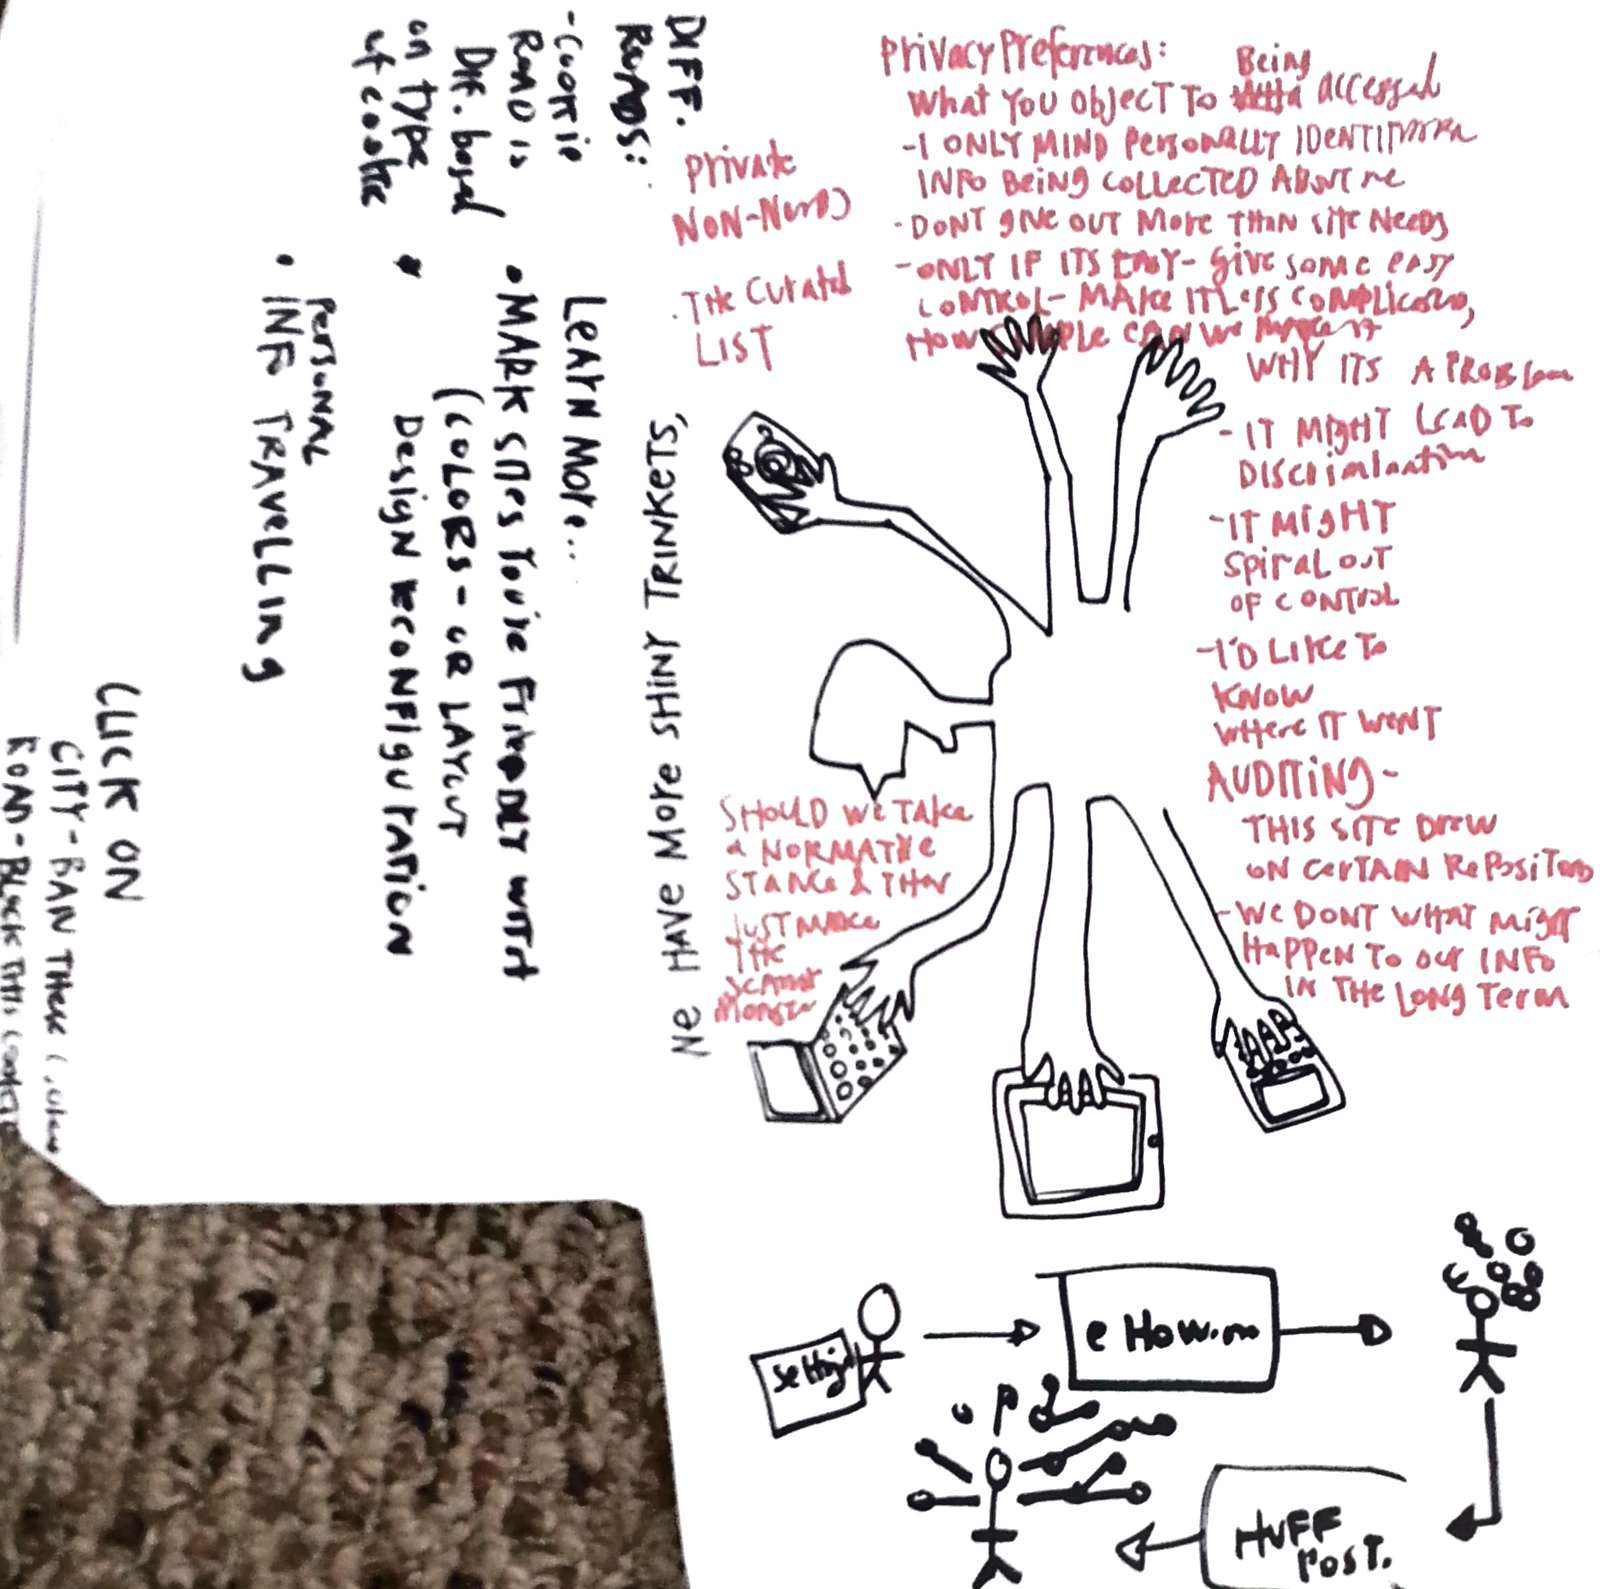 online privacy legal design notes